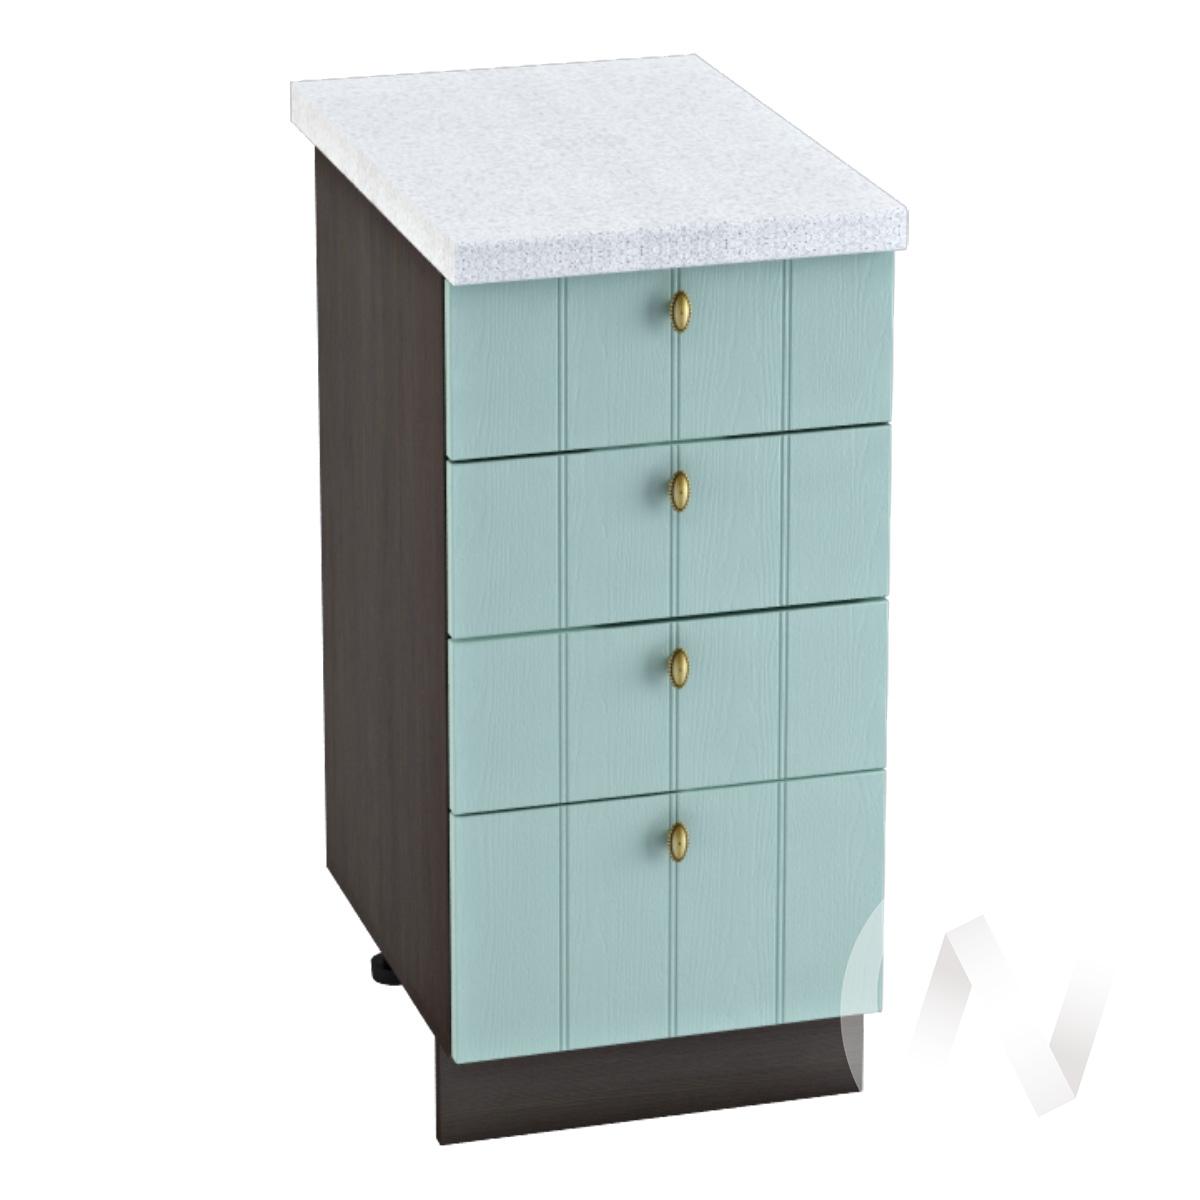 "Кухня ""Прованс"": Шкаф нижний с 4-мя ящиками 400, ШН4Я 400 (голубой/корпус венге)"